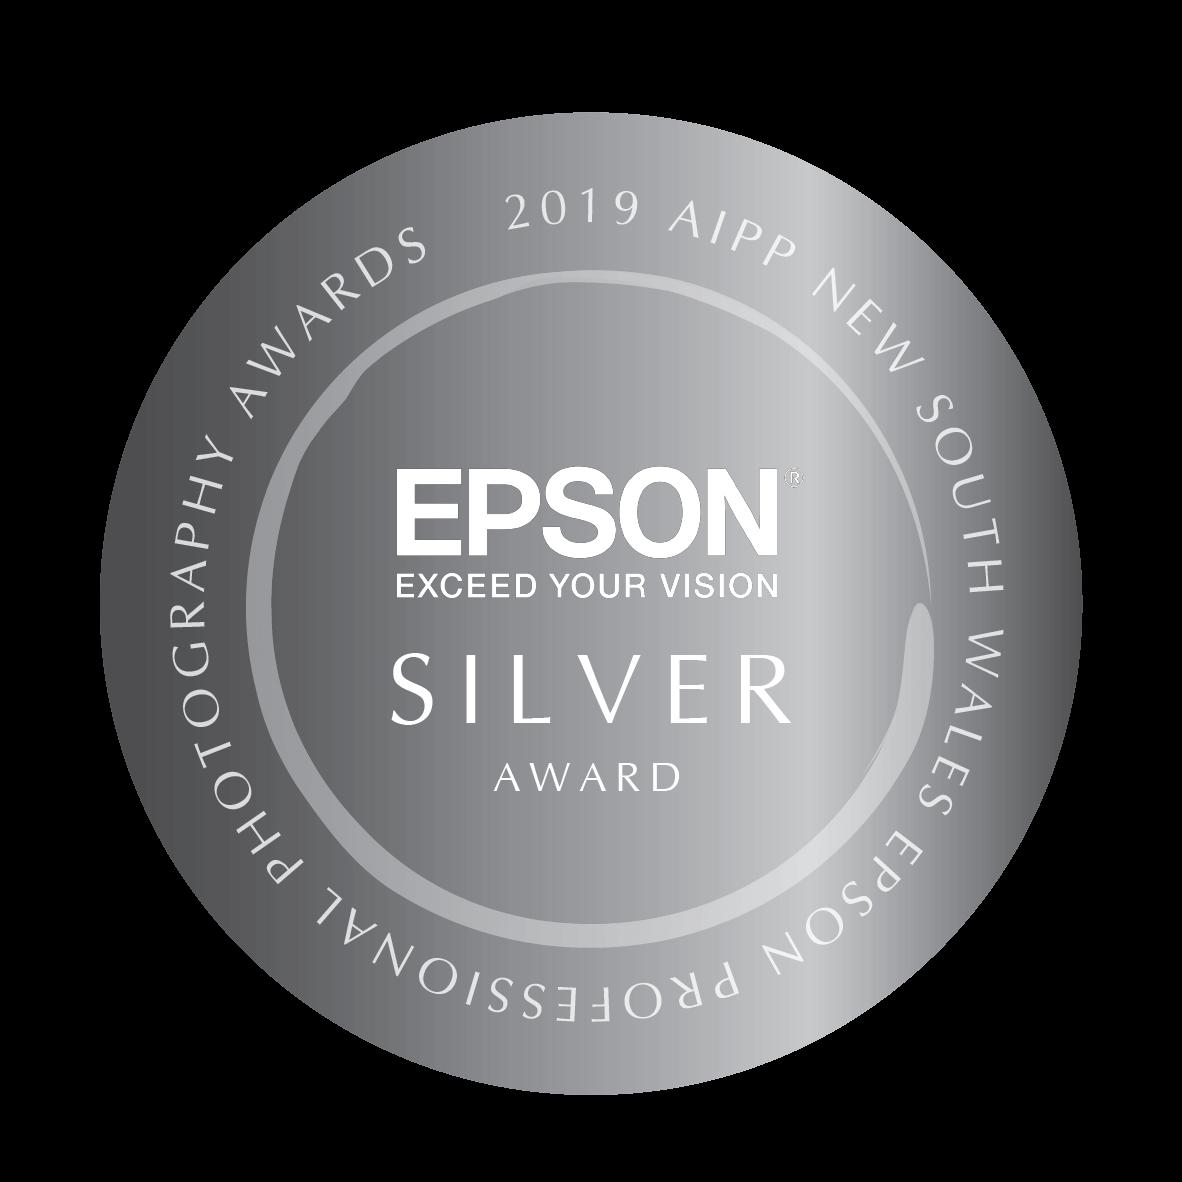 AIPP NSW Silver Award 2019